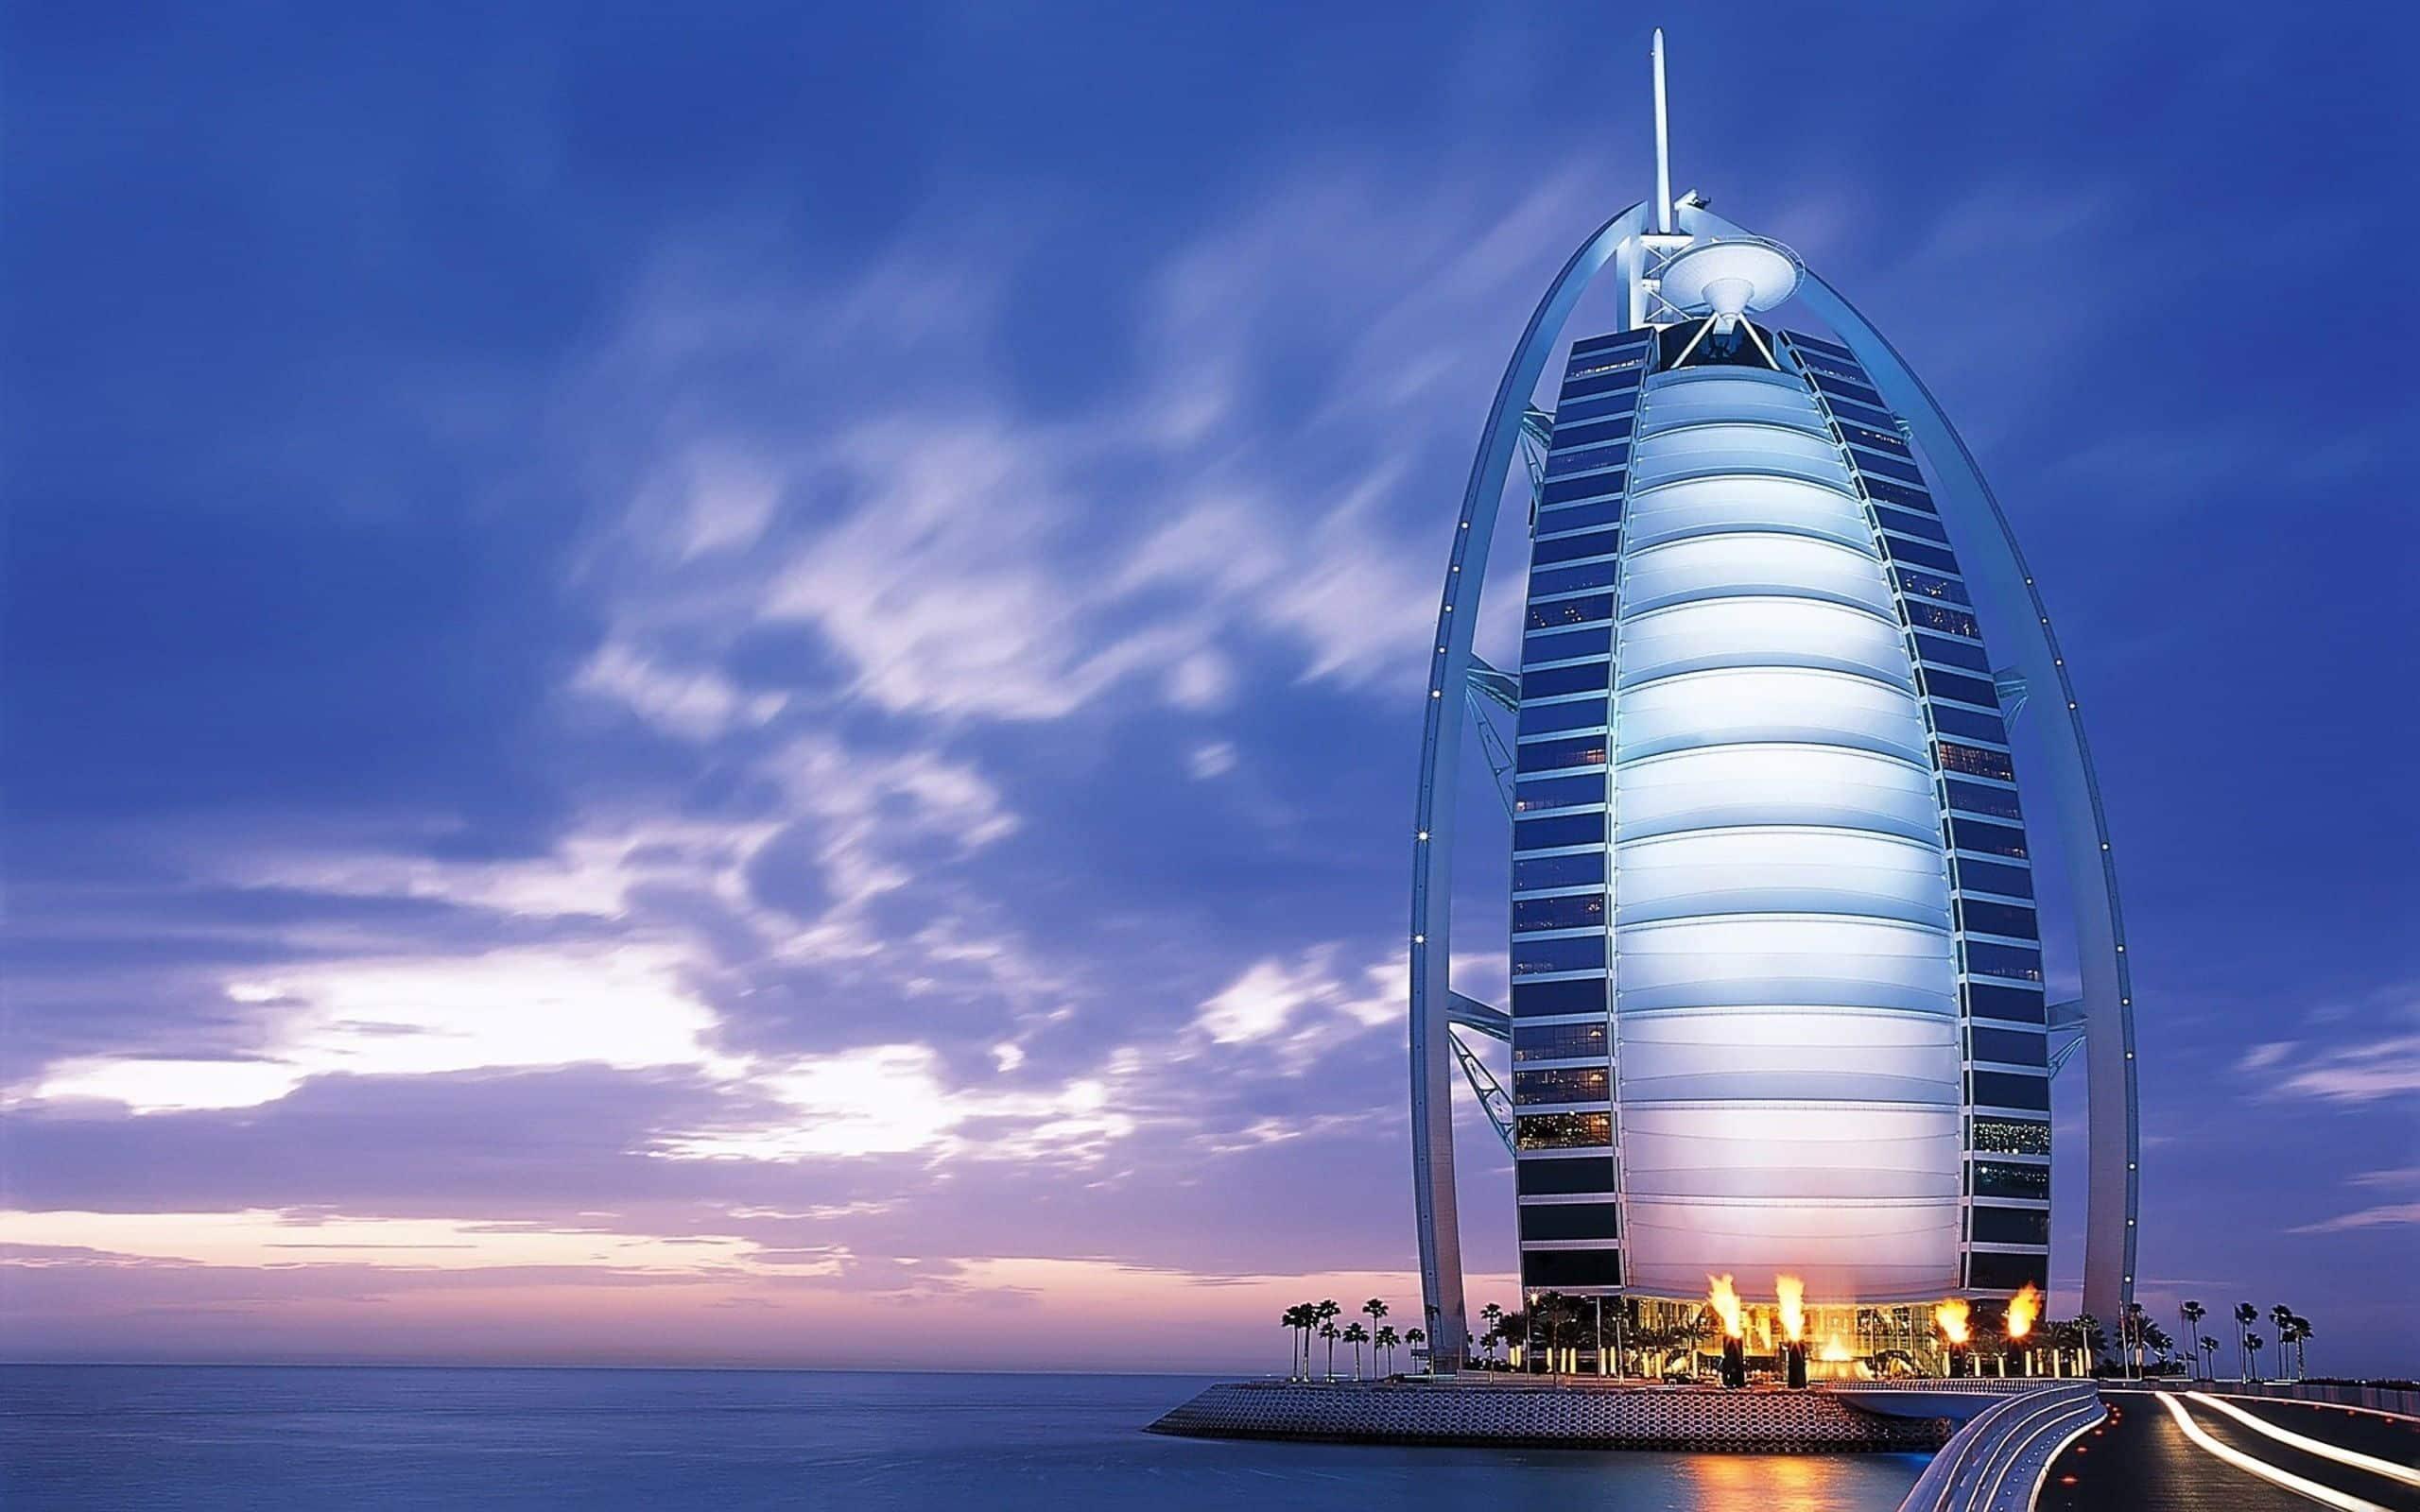 El lujoso hotel Burj Al Arab al atardecer